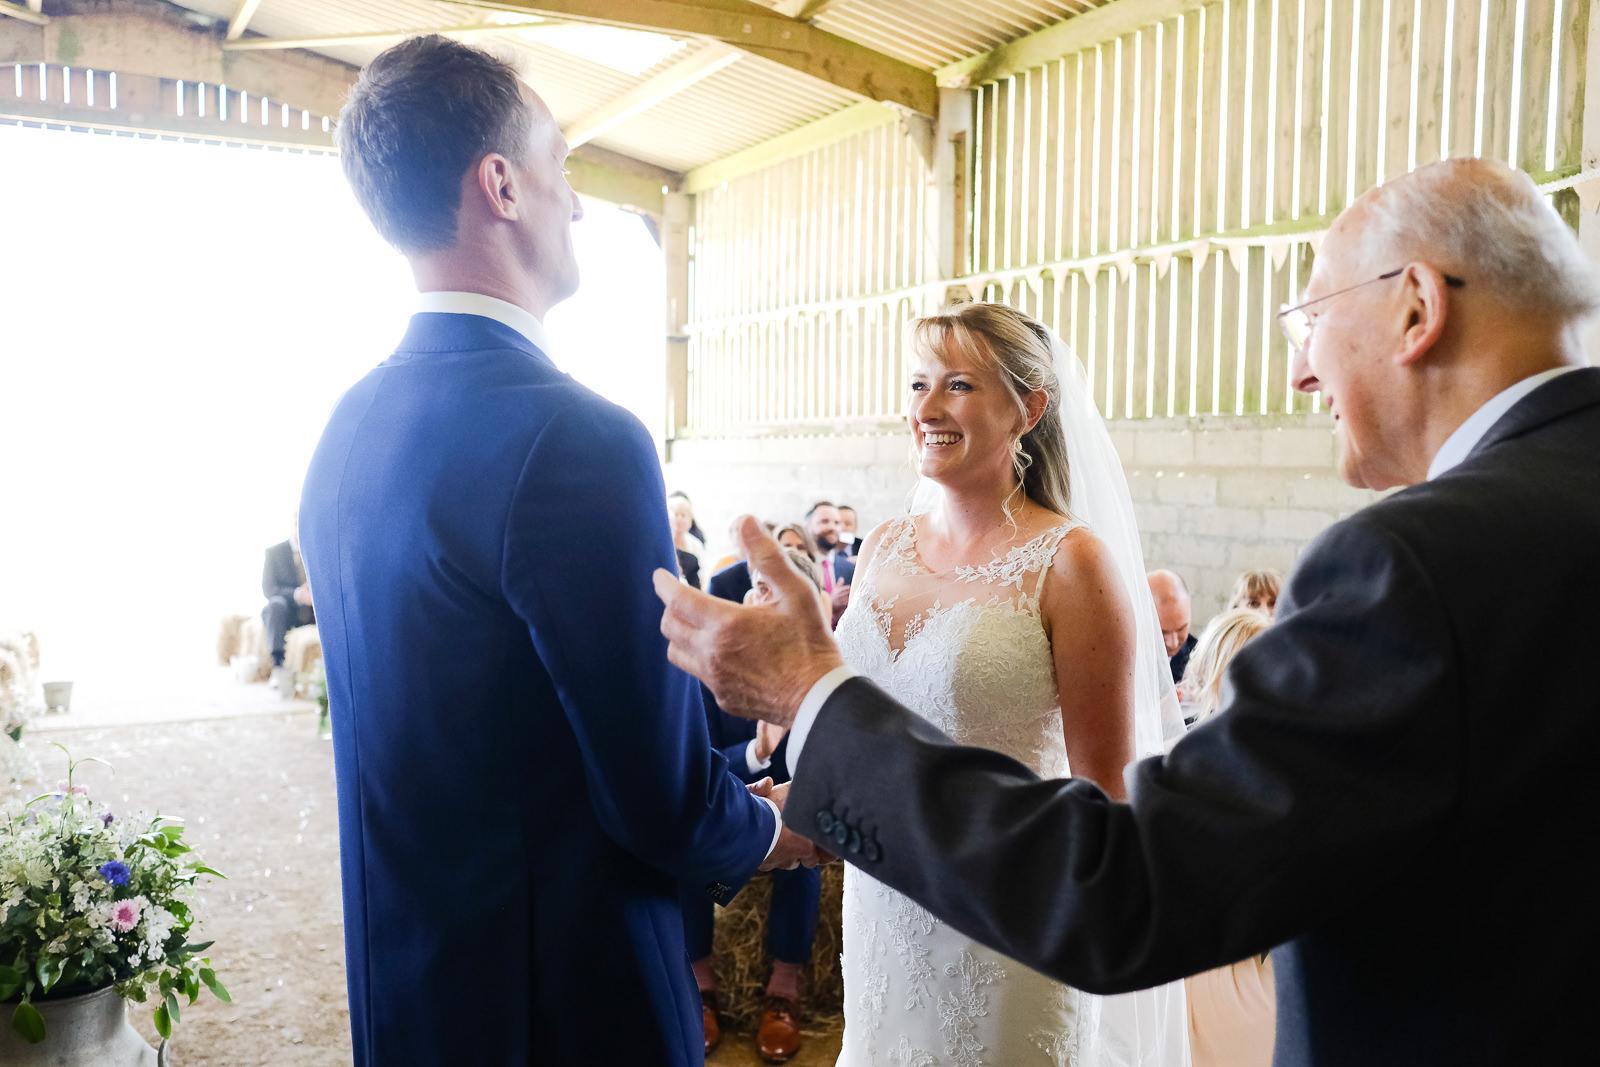 Roscarrock Farm wedding in Cornwall 034.jpg